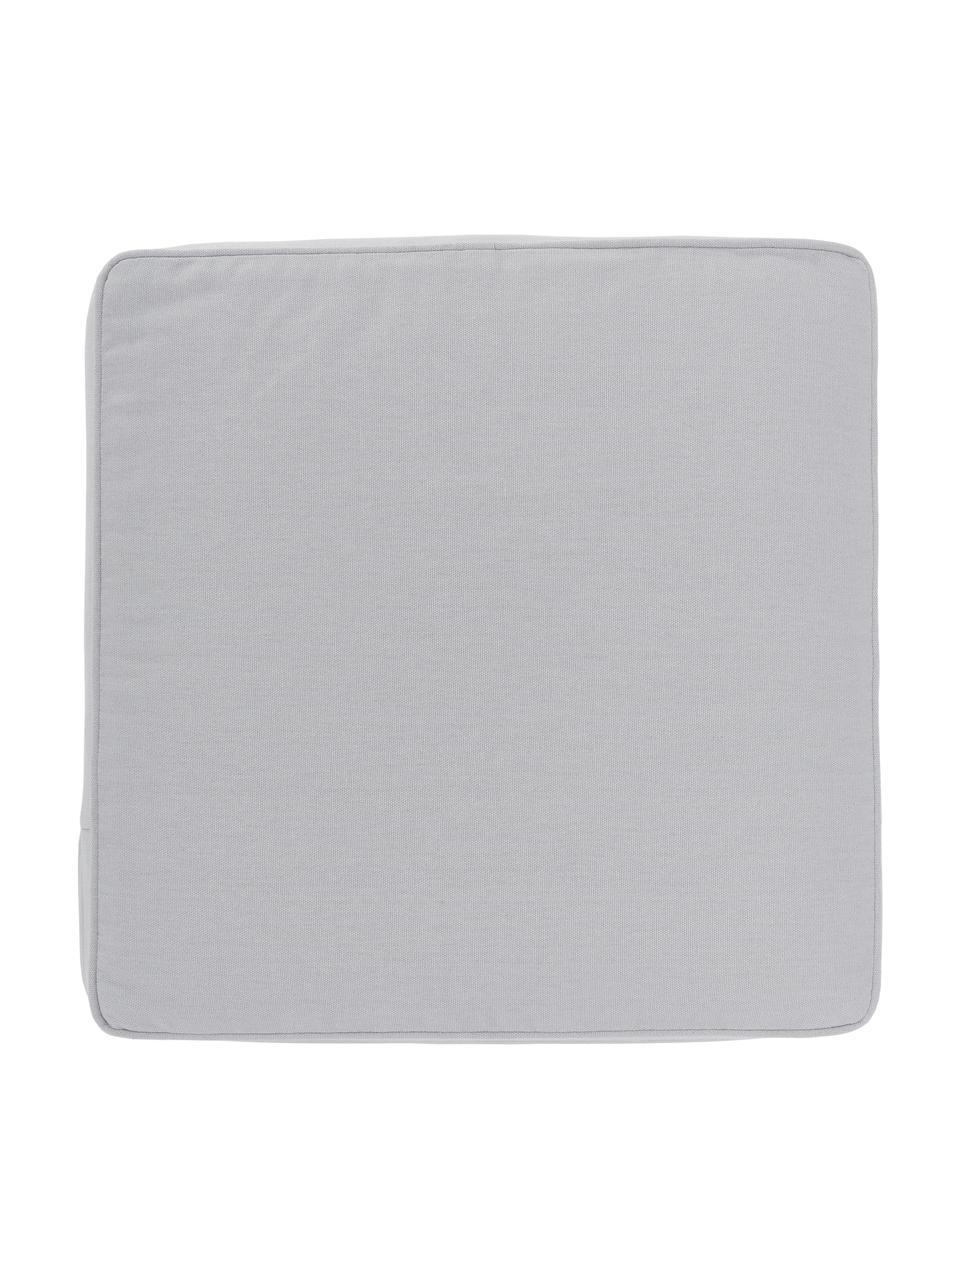 Hohes Sitzkissen Zoey in Hellgrau, Bezug: 100% Baumwolle, Grau, 40 x 40 cm